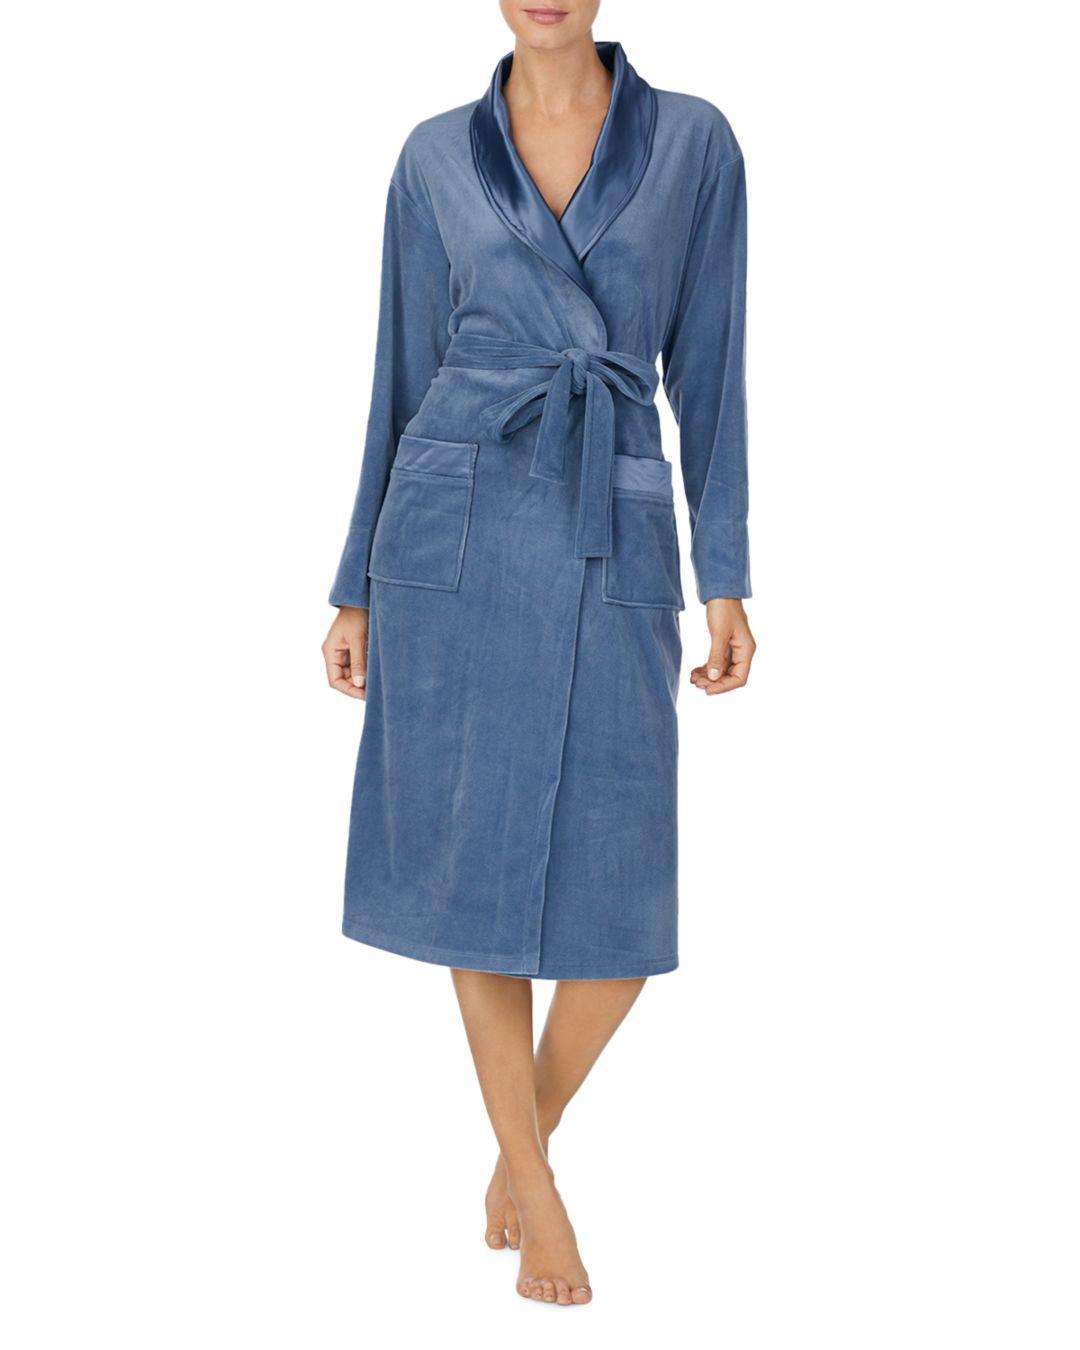 Lyst - Donna Karan Plush Long Robe in Blue 3b733f2a4